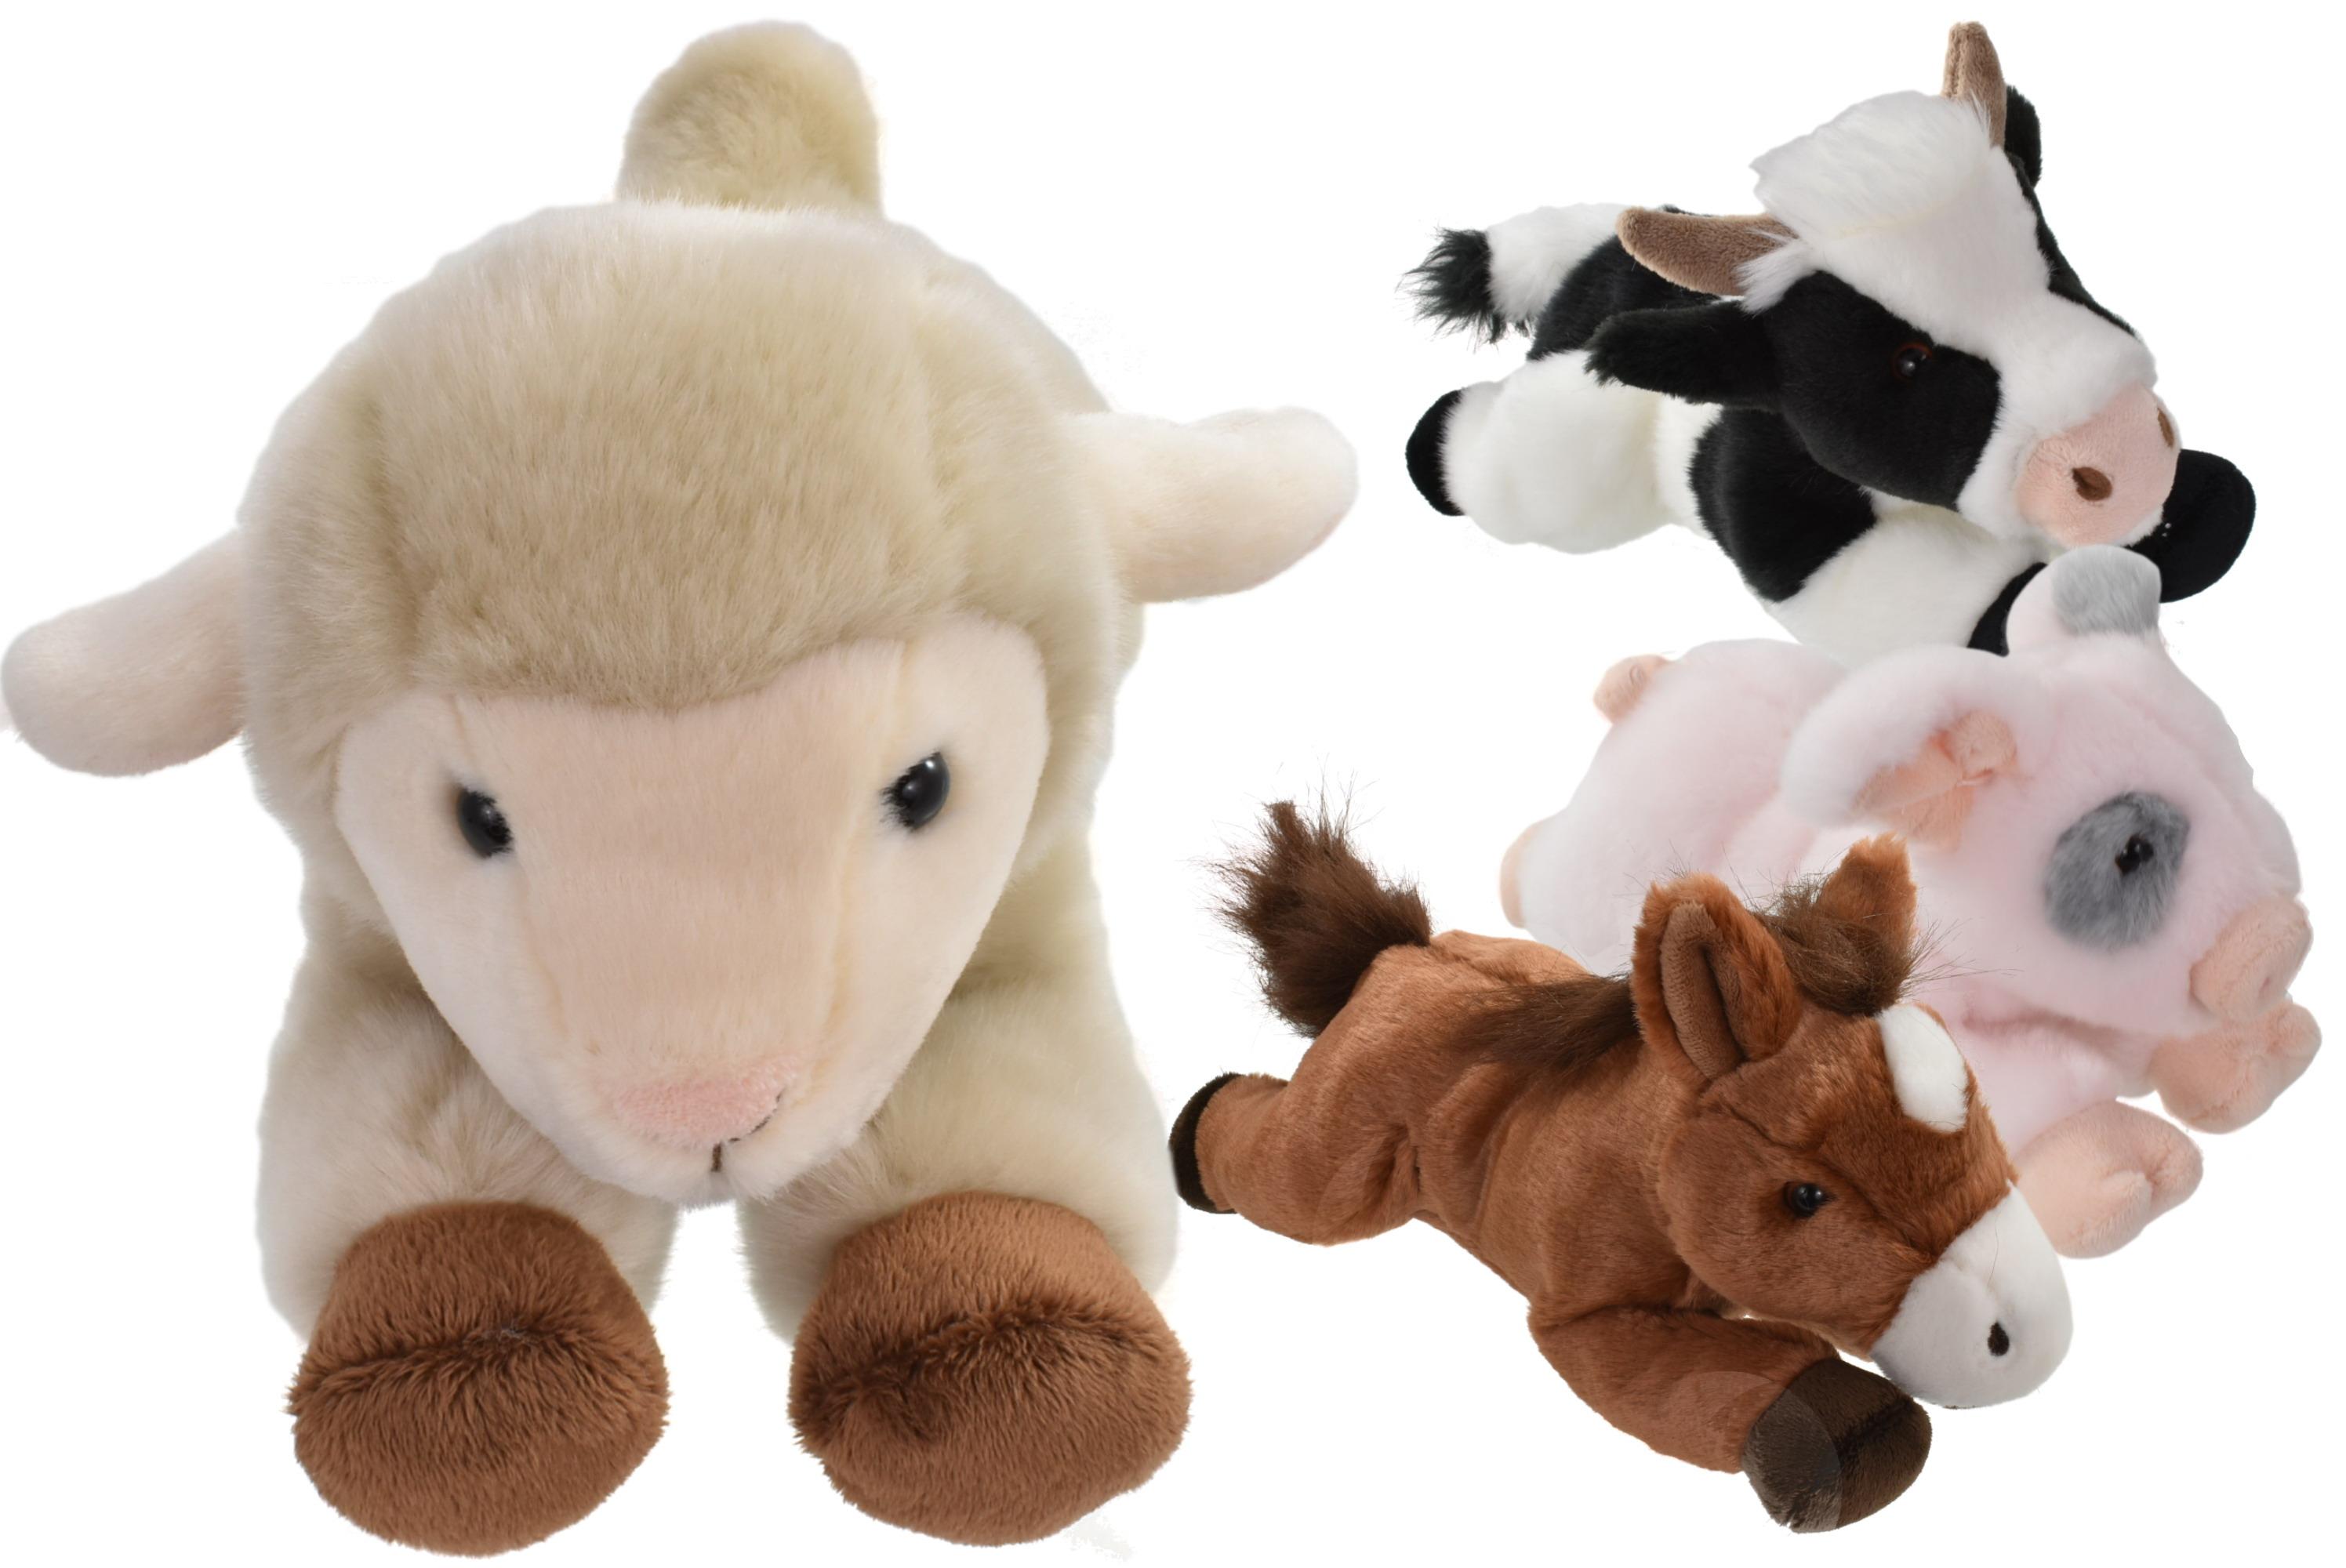 30cm Plush Lying Down Farm Animals - 4 Assorted Colours